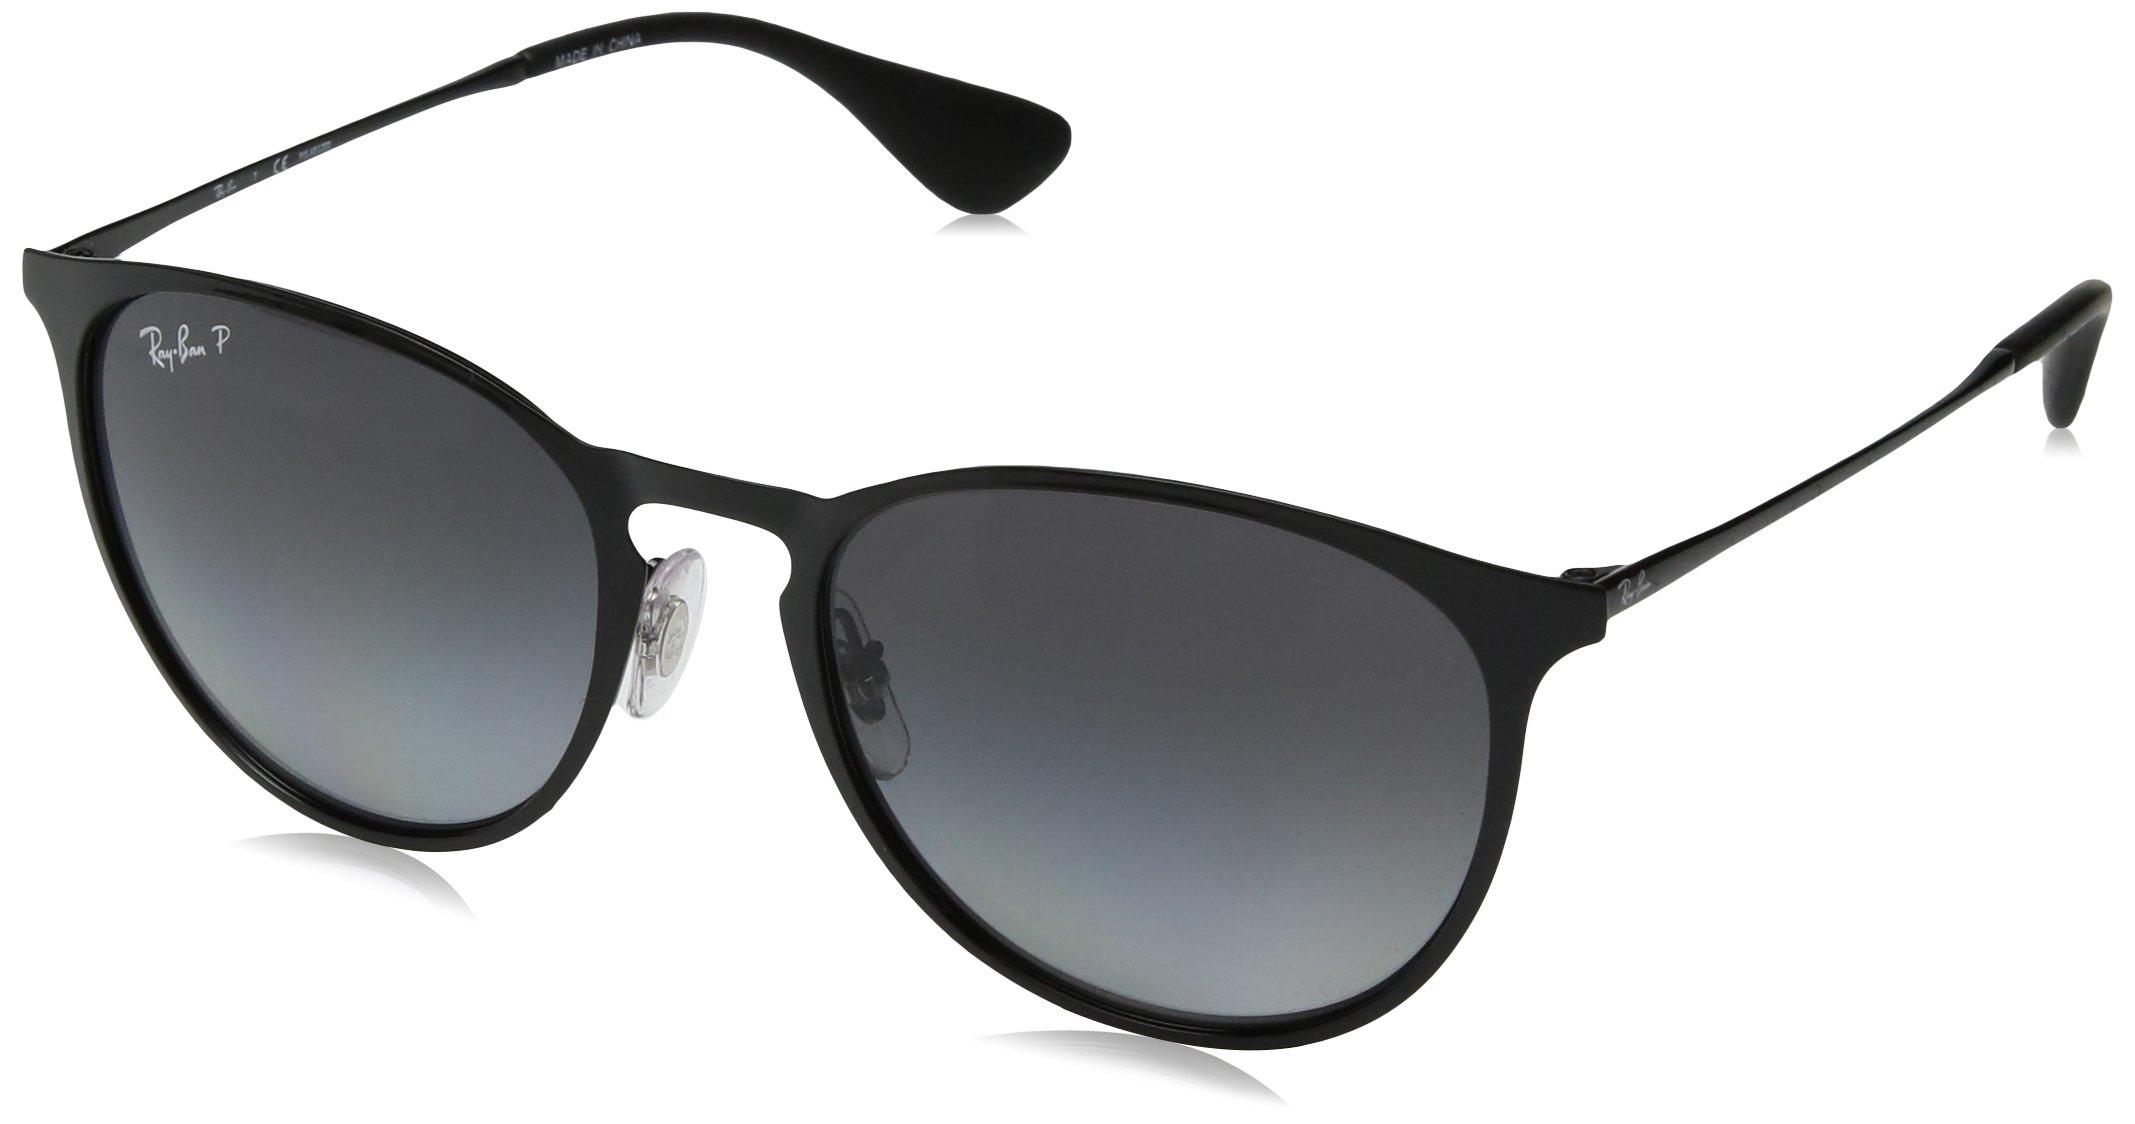 RAY-BAN RB3539 Erika Round Metal Sunglasses, Shiny Black/Polarized Grey Gradient, 54 mm by RAY-BAN